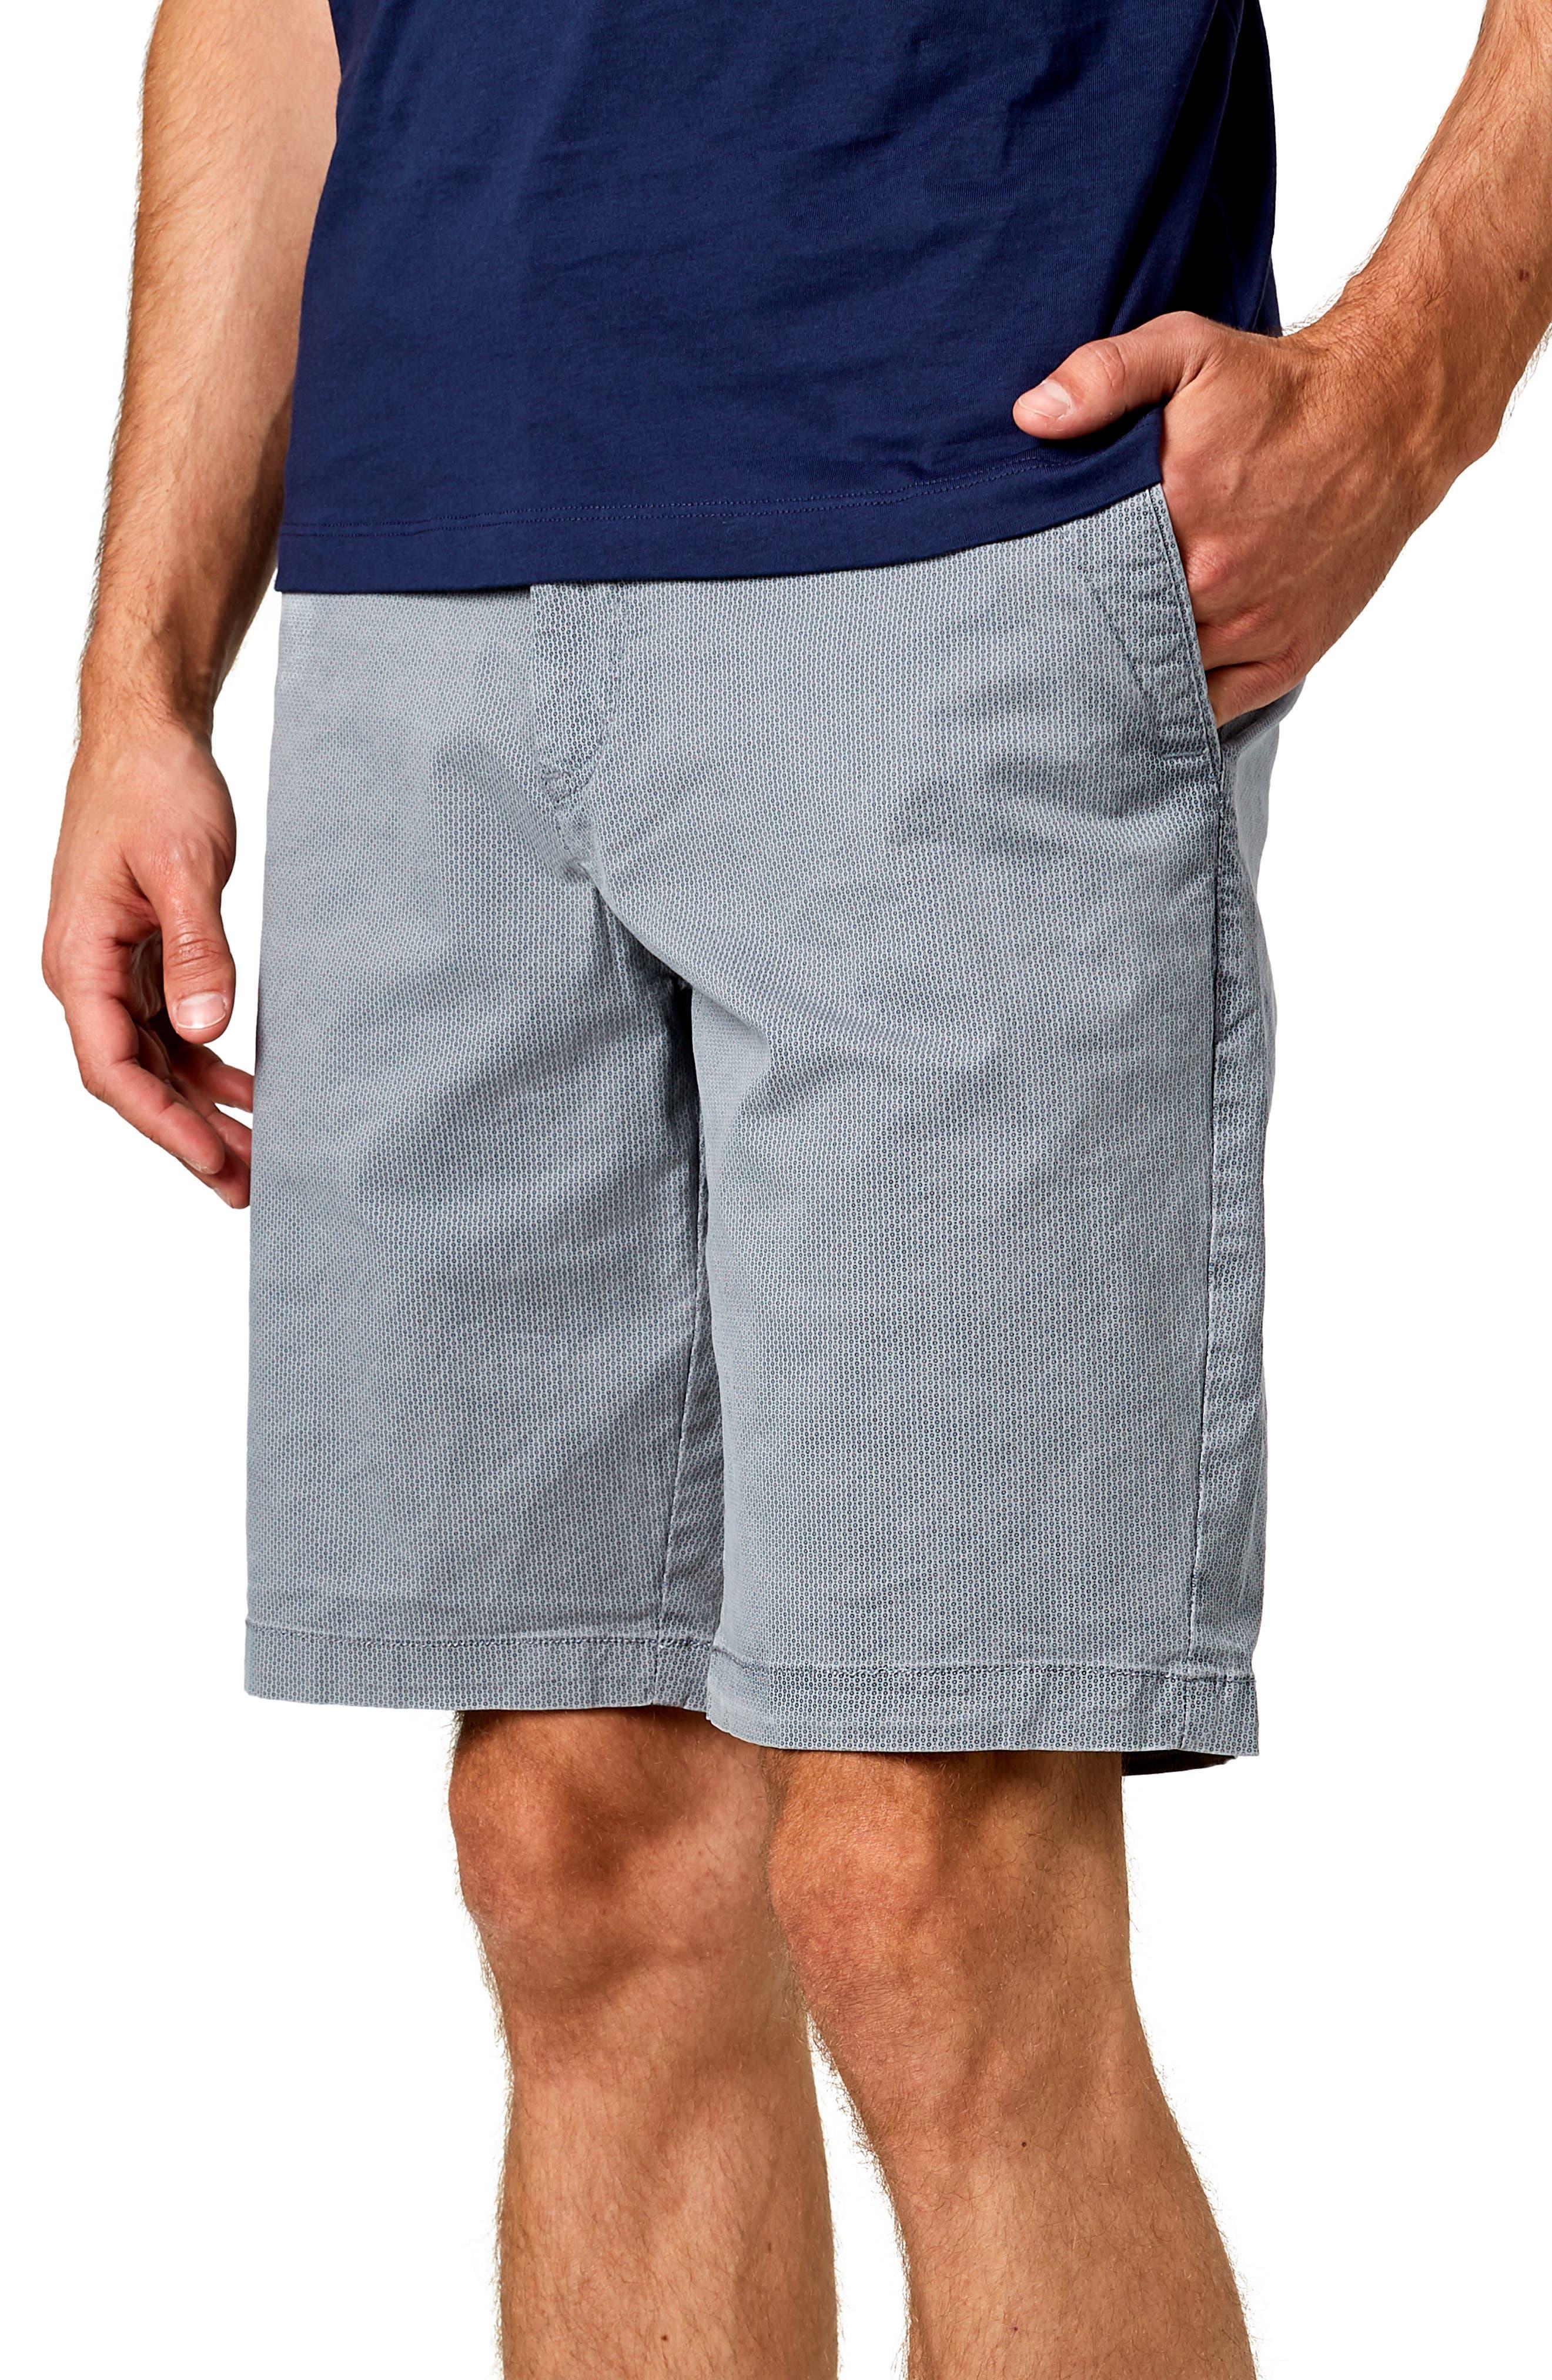 Acceleration Print Shorts,                             Alternate thumbnail 3, color,                             GREY